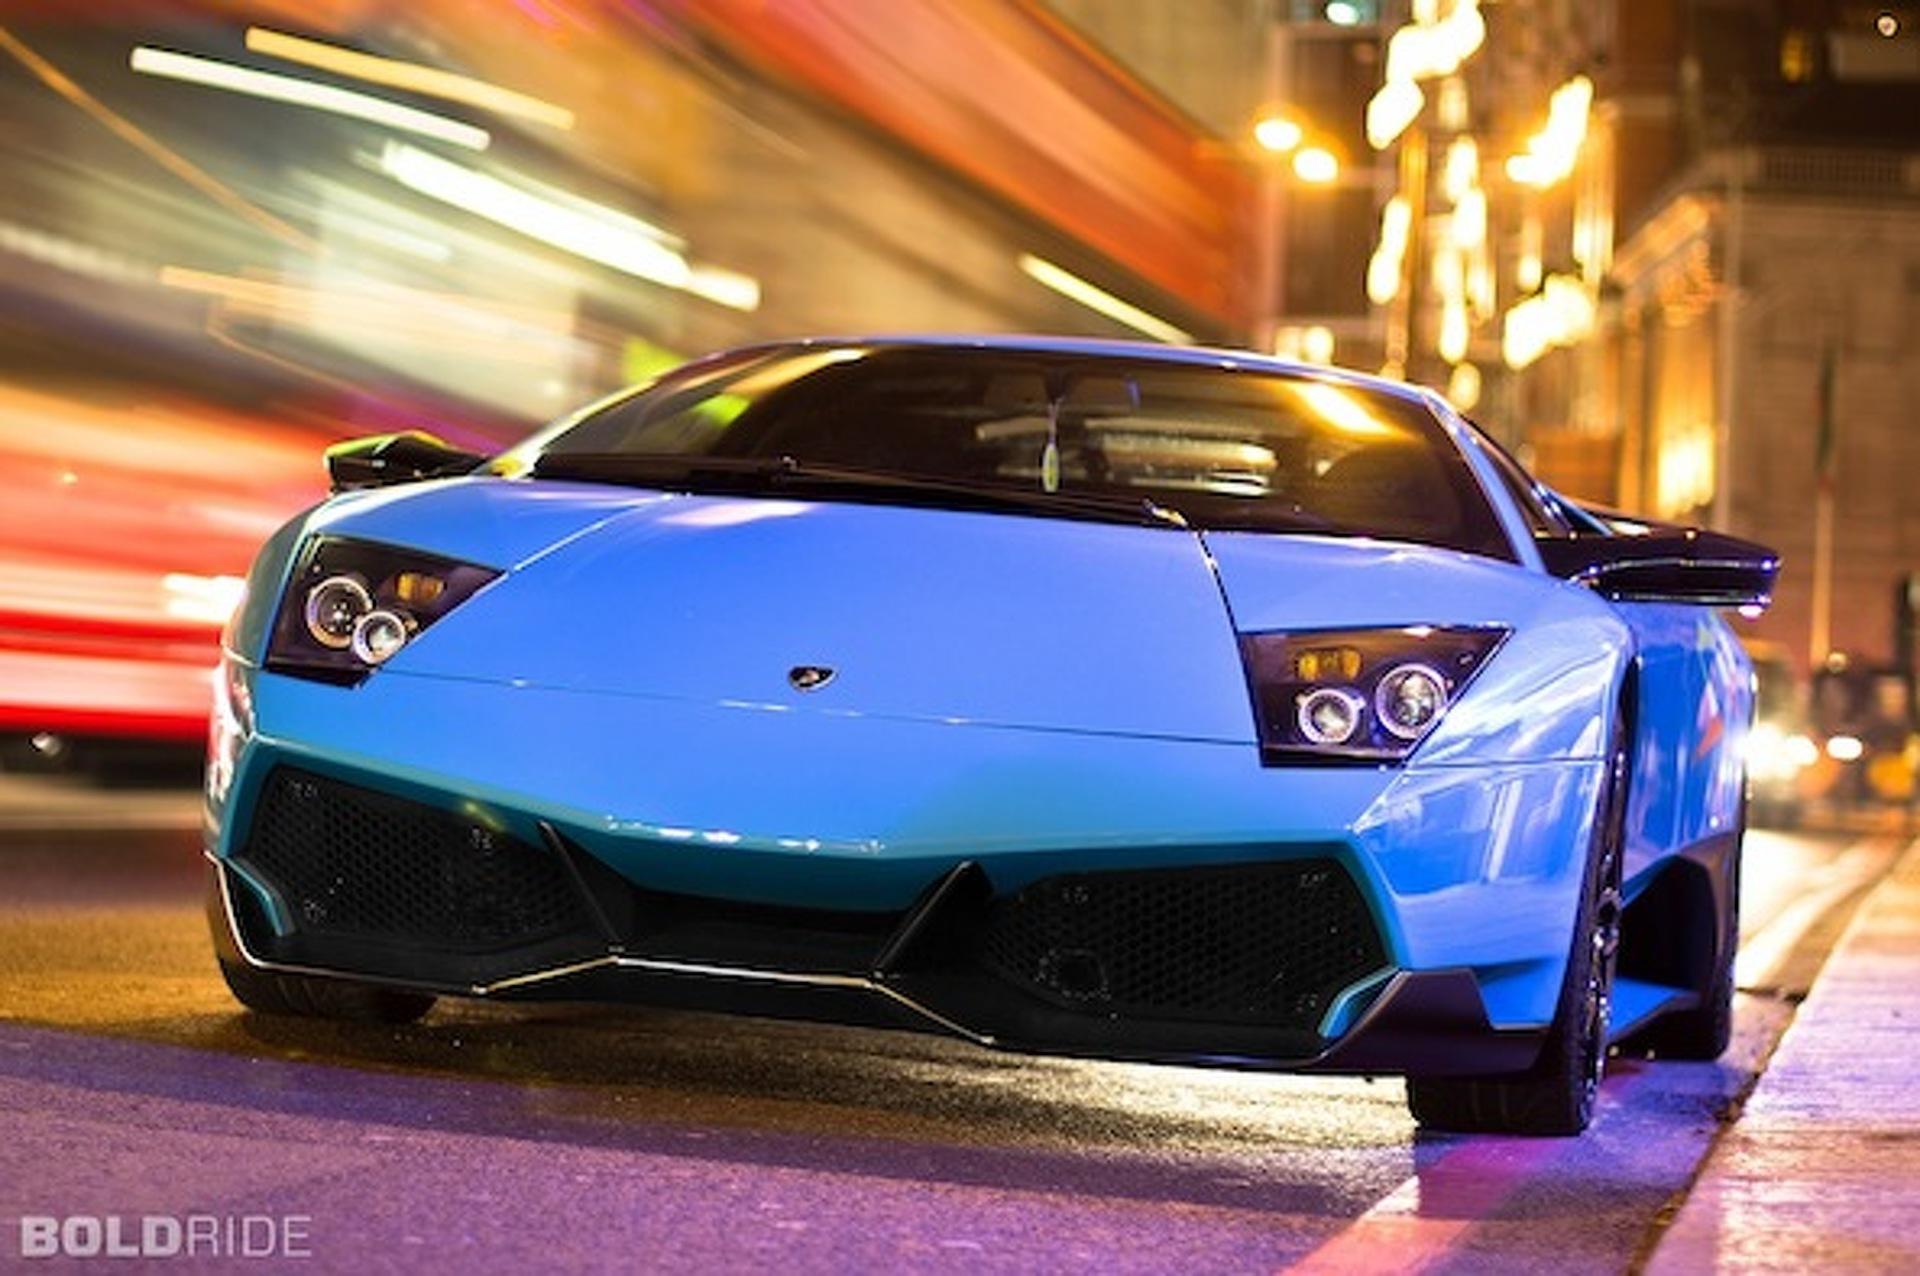 Wheels Wallpaper: Lamborghini Murcielago SV